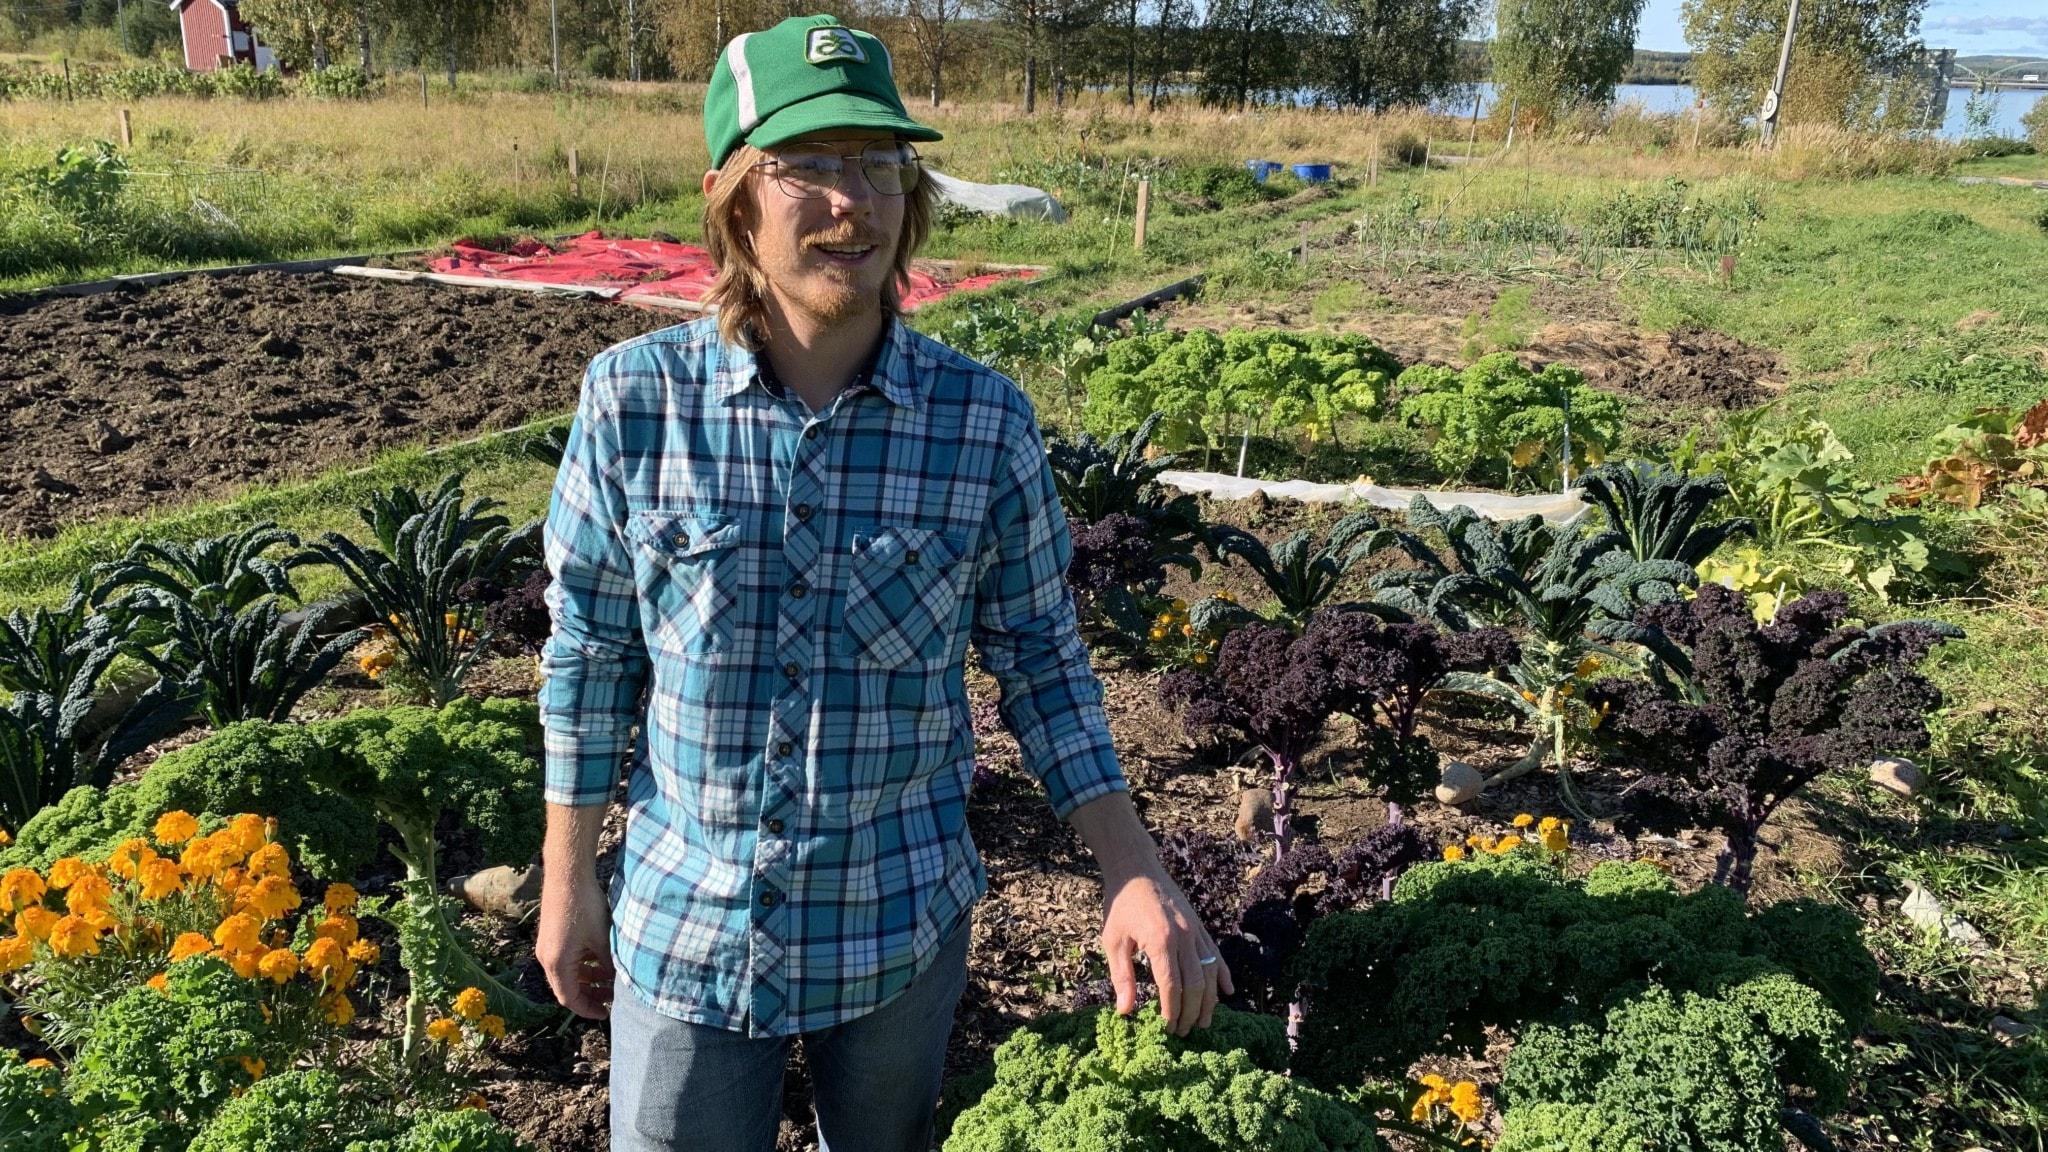 Josh Armfield i rutig skjorta bland sina odlingar.